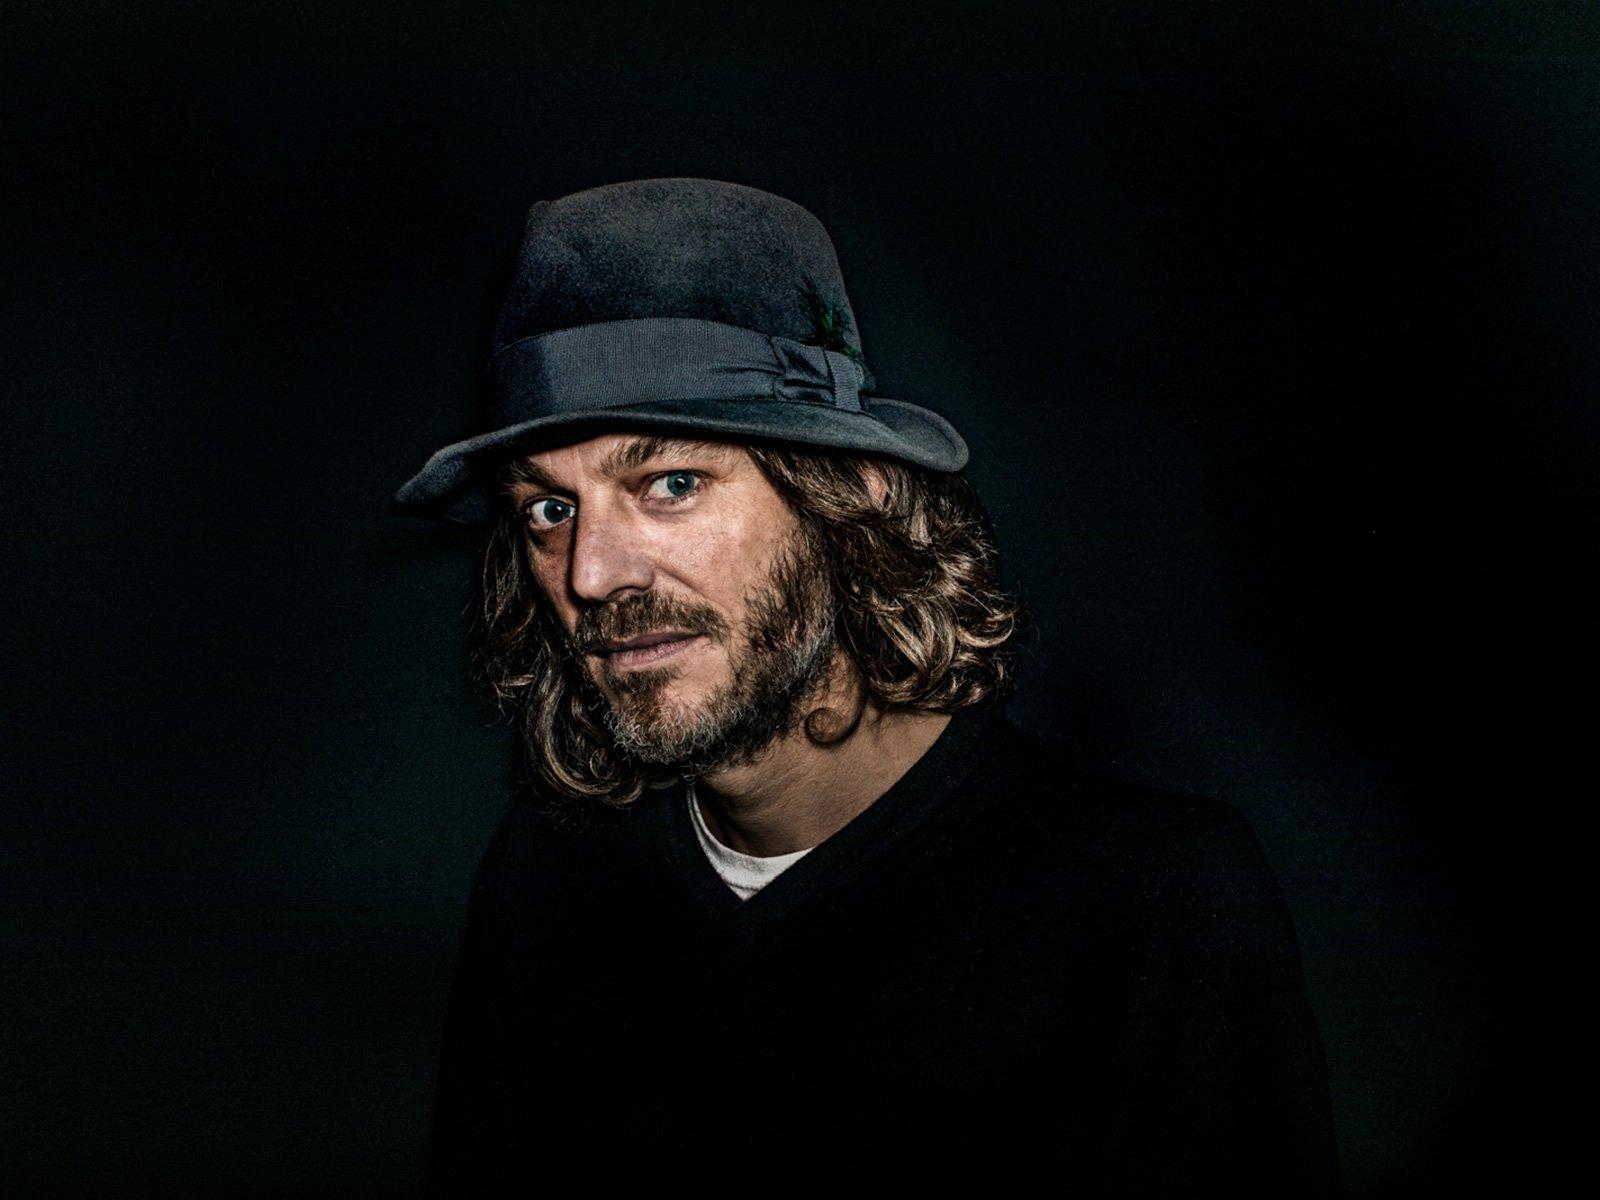 David Bastedo - Photographer, Artists & Creative Technologist